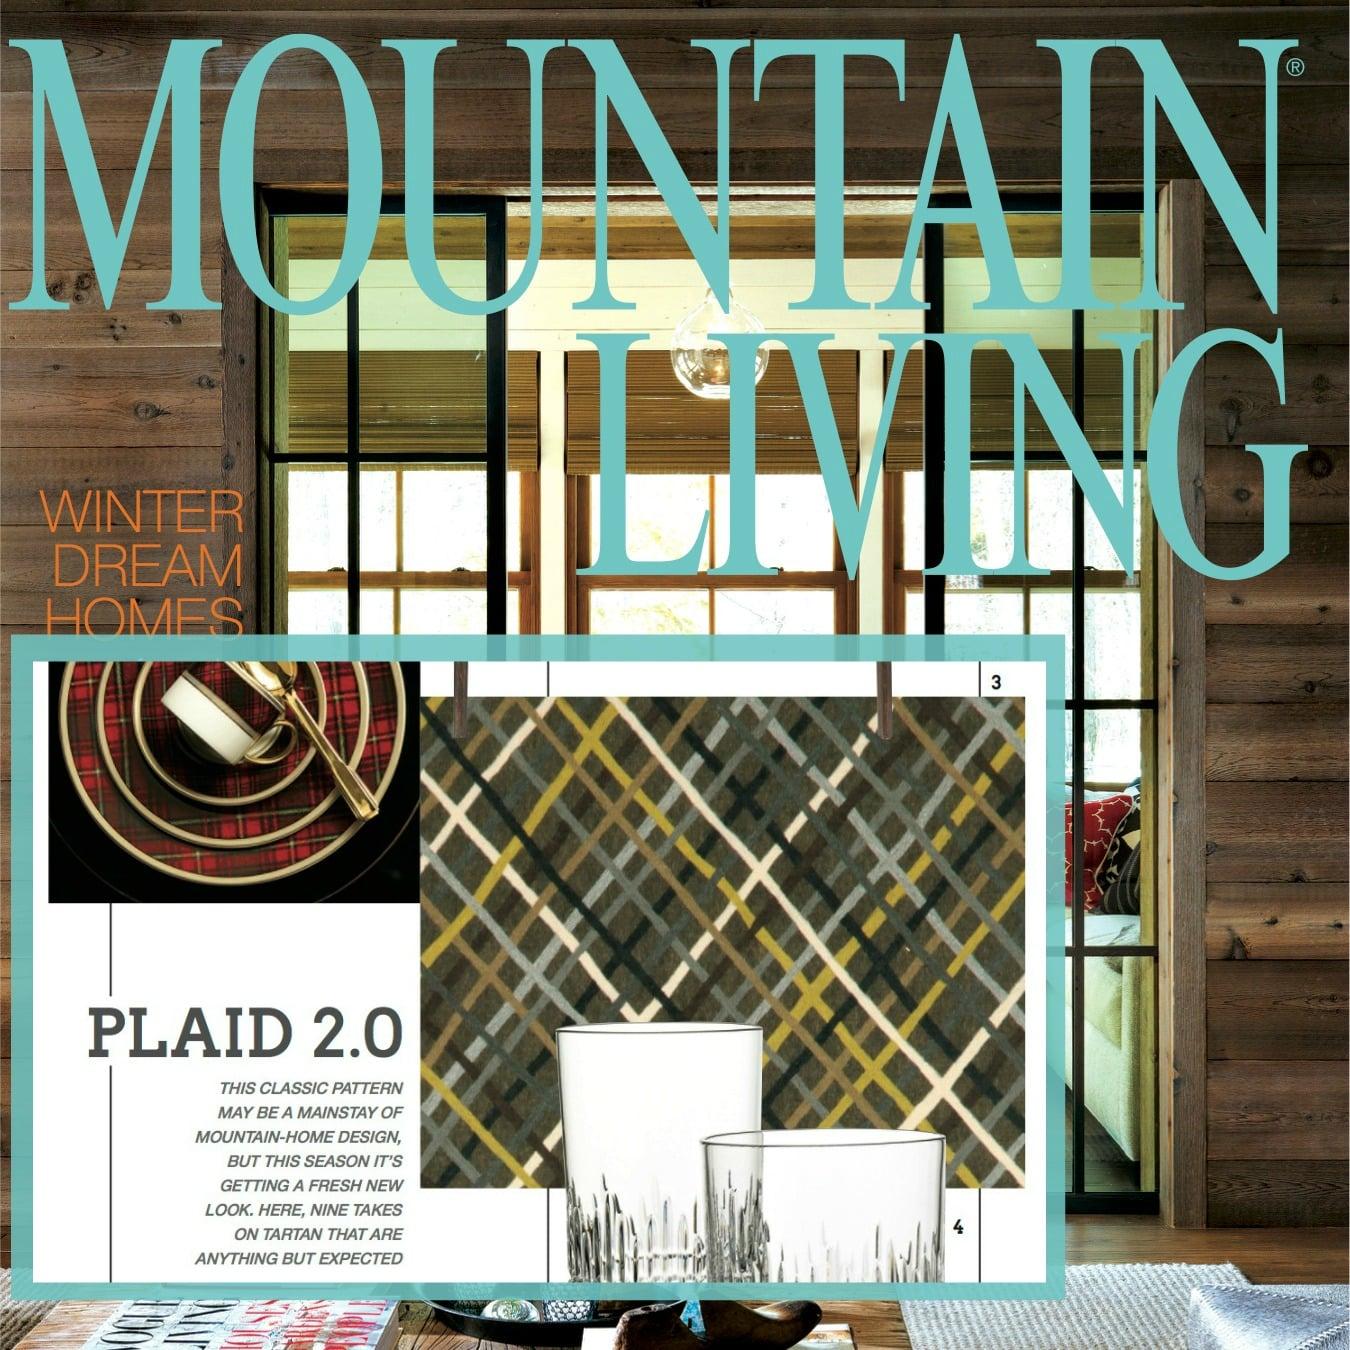 Mountain Living Press Clip.jpg